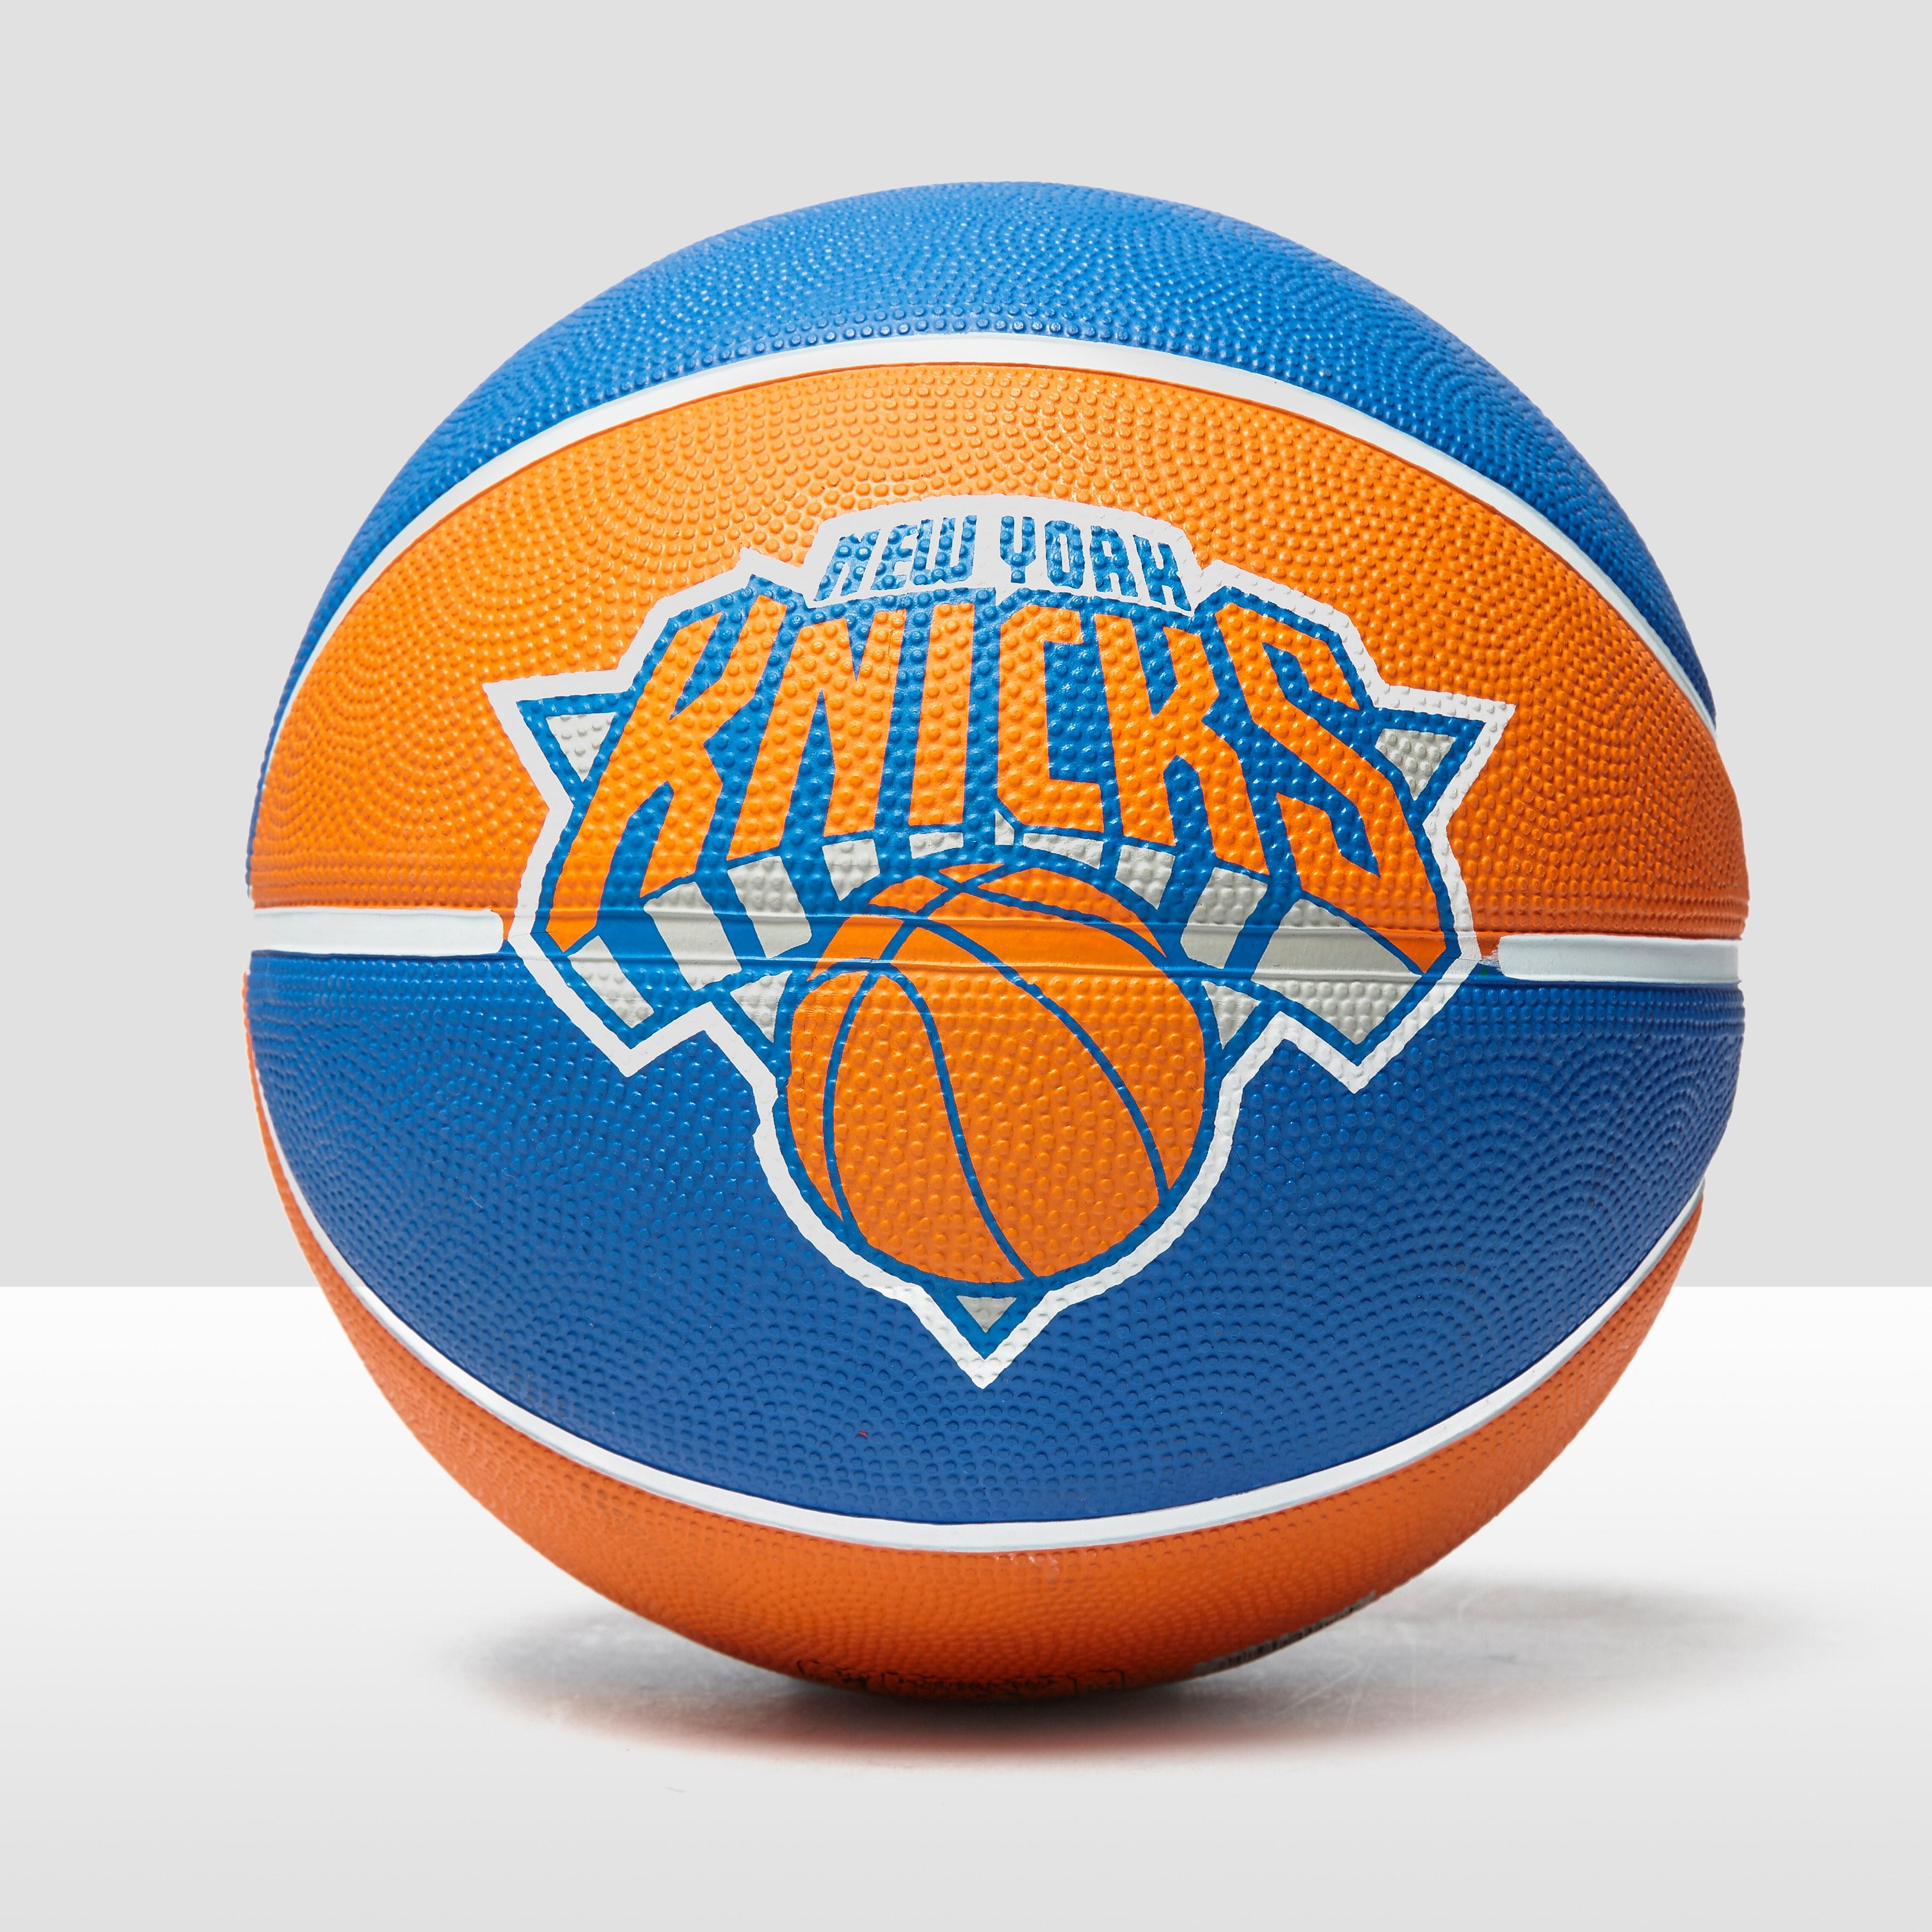 Spalding NBA NY KNICKS TEAM BASKETBALL